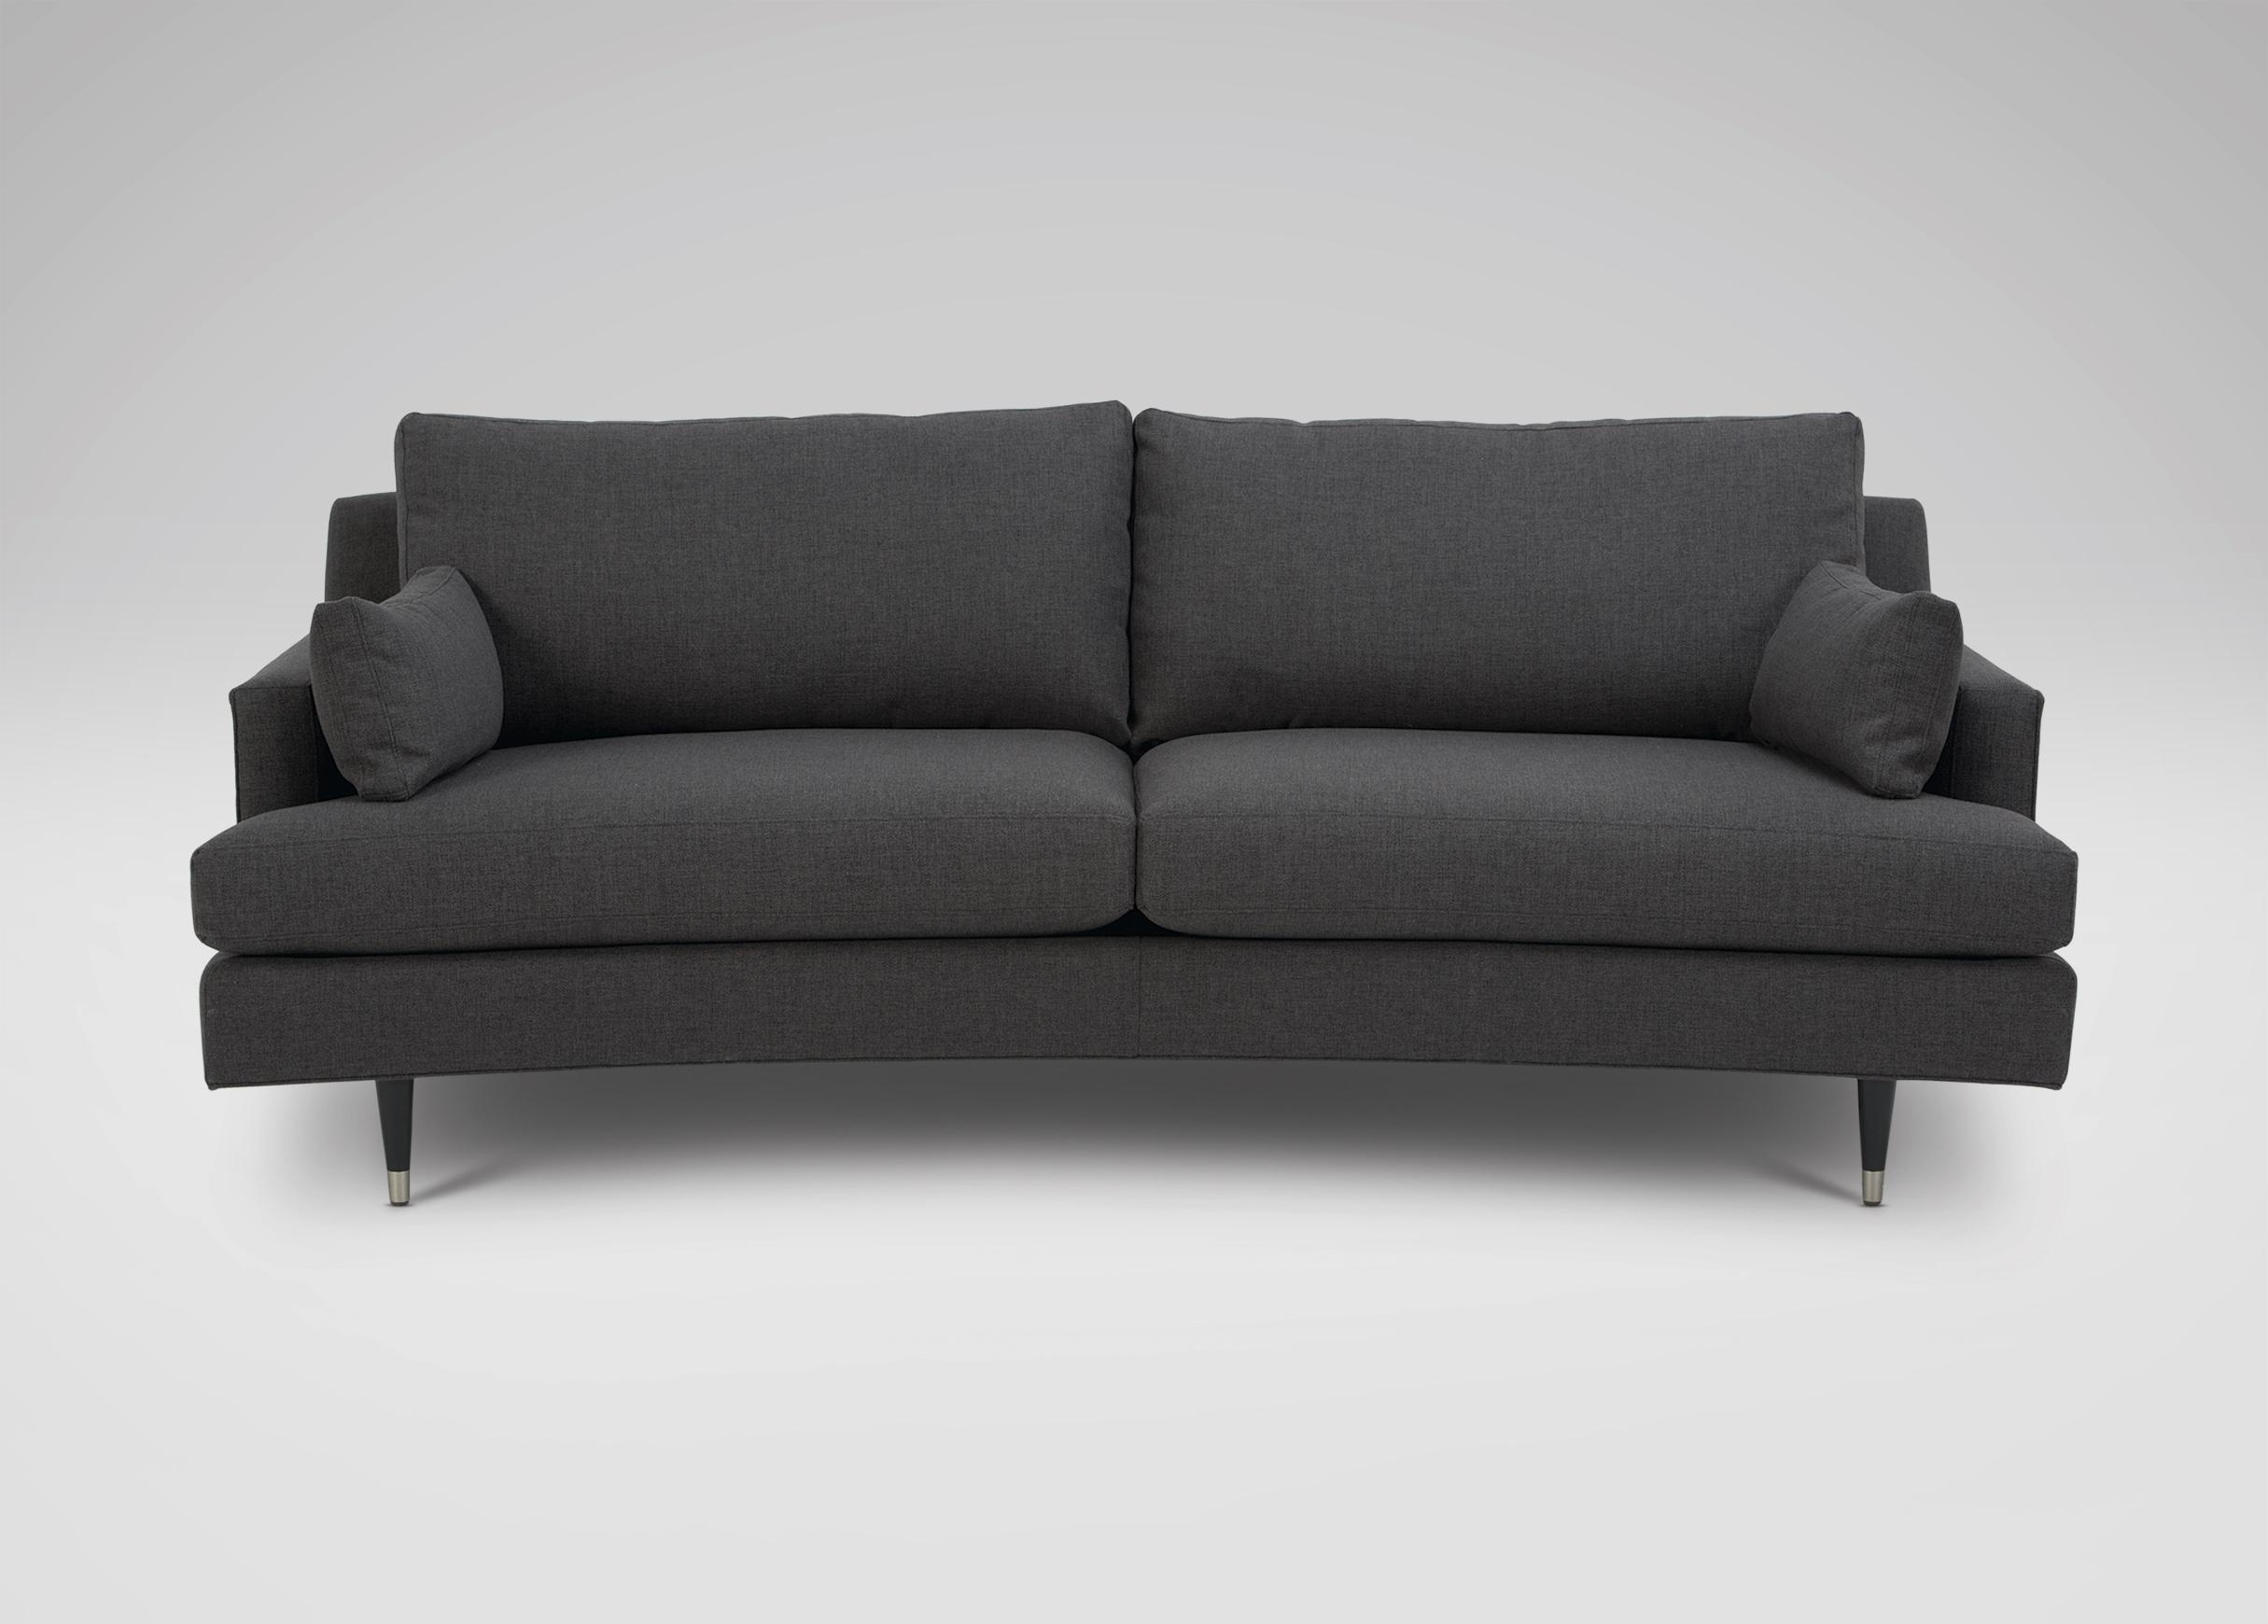 Apollo Sofa | Sofas & Loveseats With Regard To Ethan Allen Sofas And Chairs (View 18 of 20)